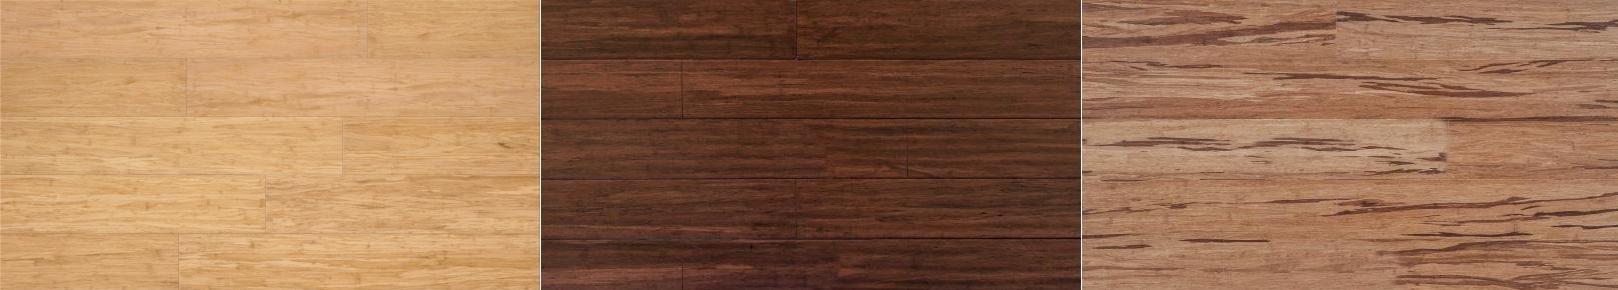 Bambusové podlahy - dekory